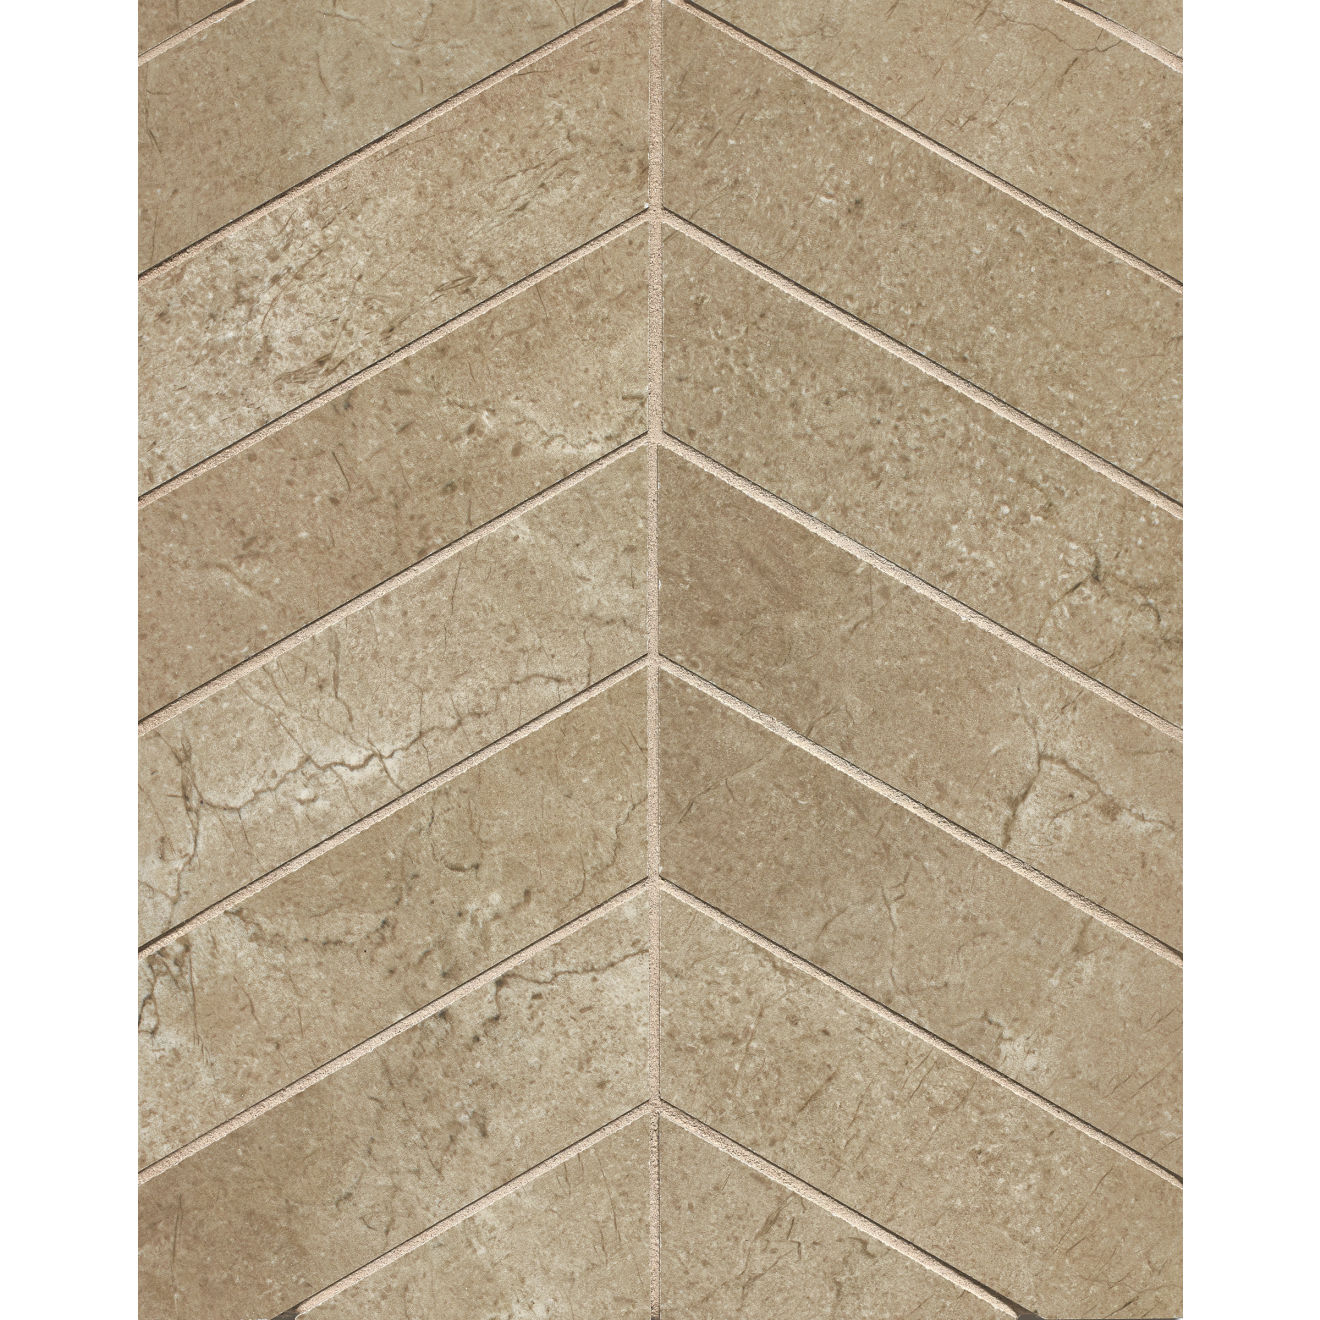 "Marfil 2"" x 2"" Floor & Wall Mosaic in Noce"